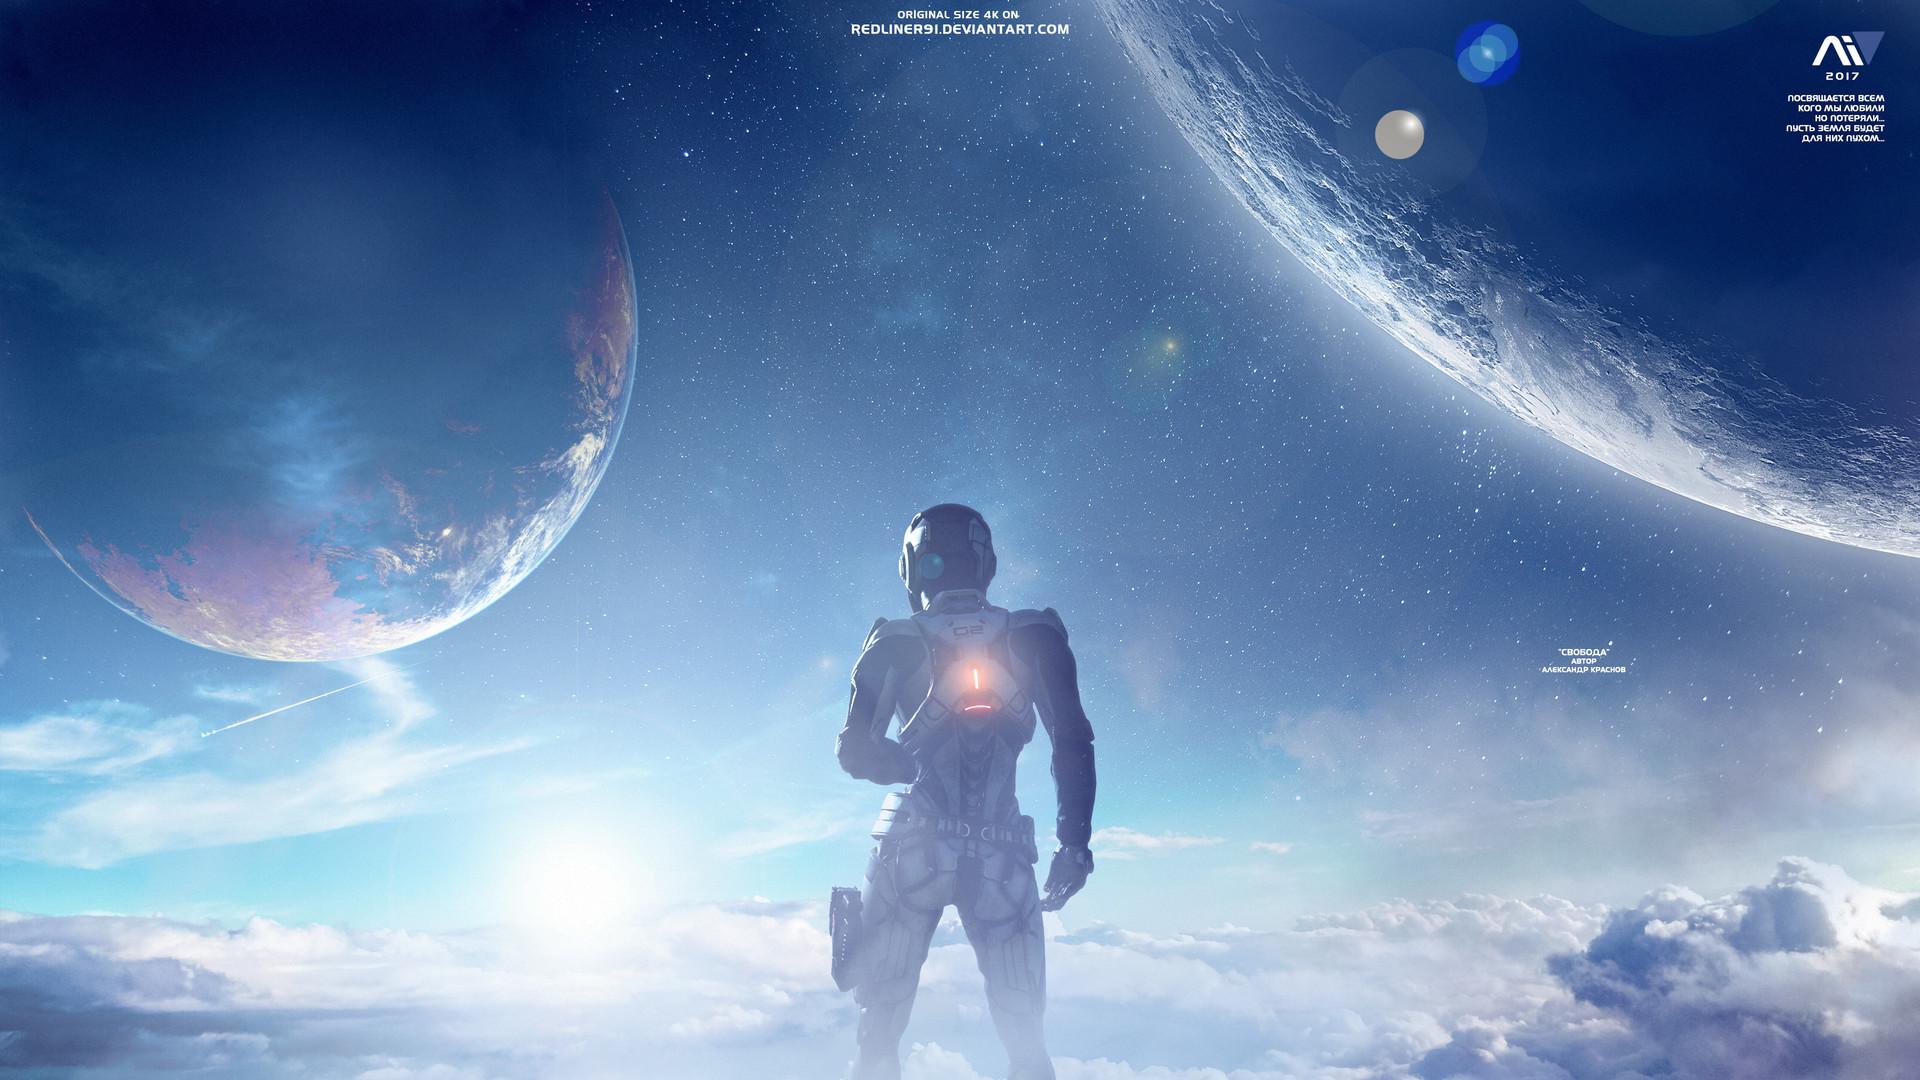 Alexander Krasnov Freedom Mass Effect Andromeda 4k